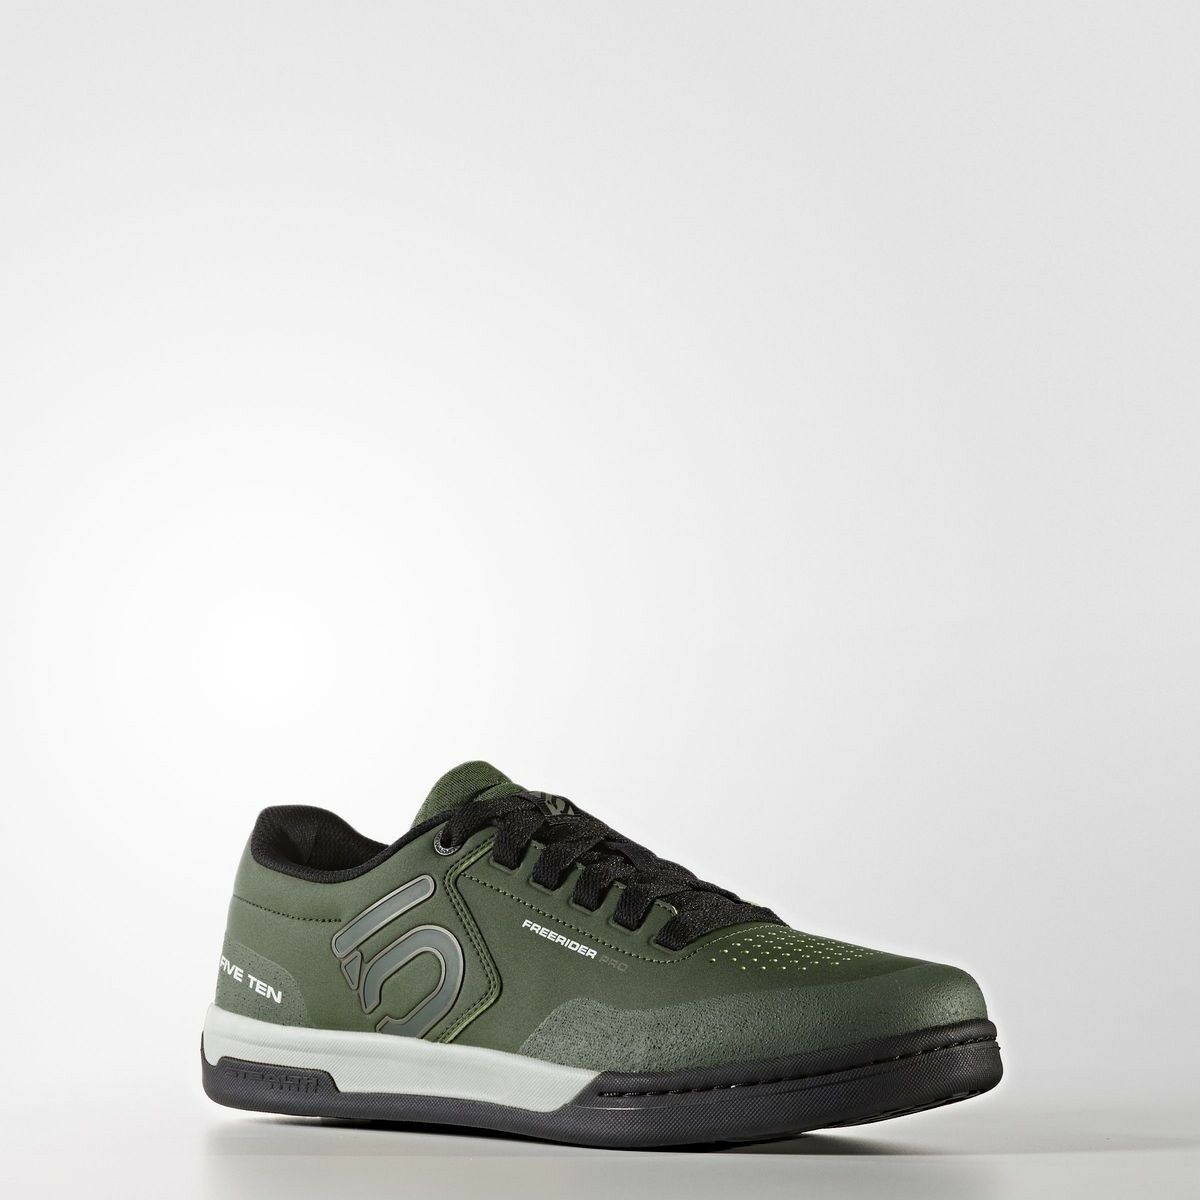 Five Ten 5.10 freerider pro Olive-cargo Platform pedal zapatos